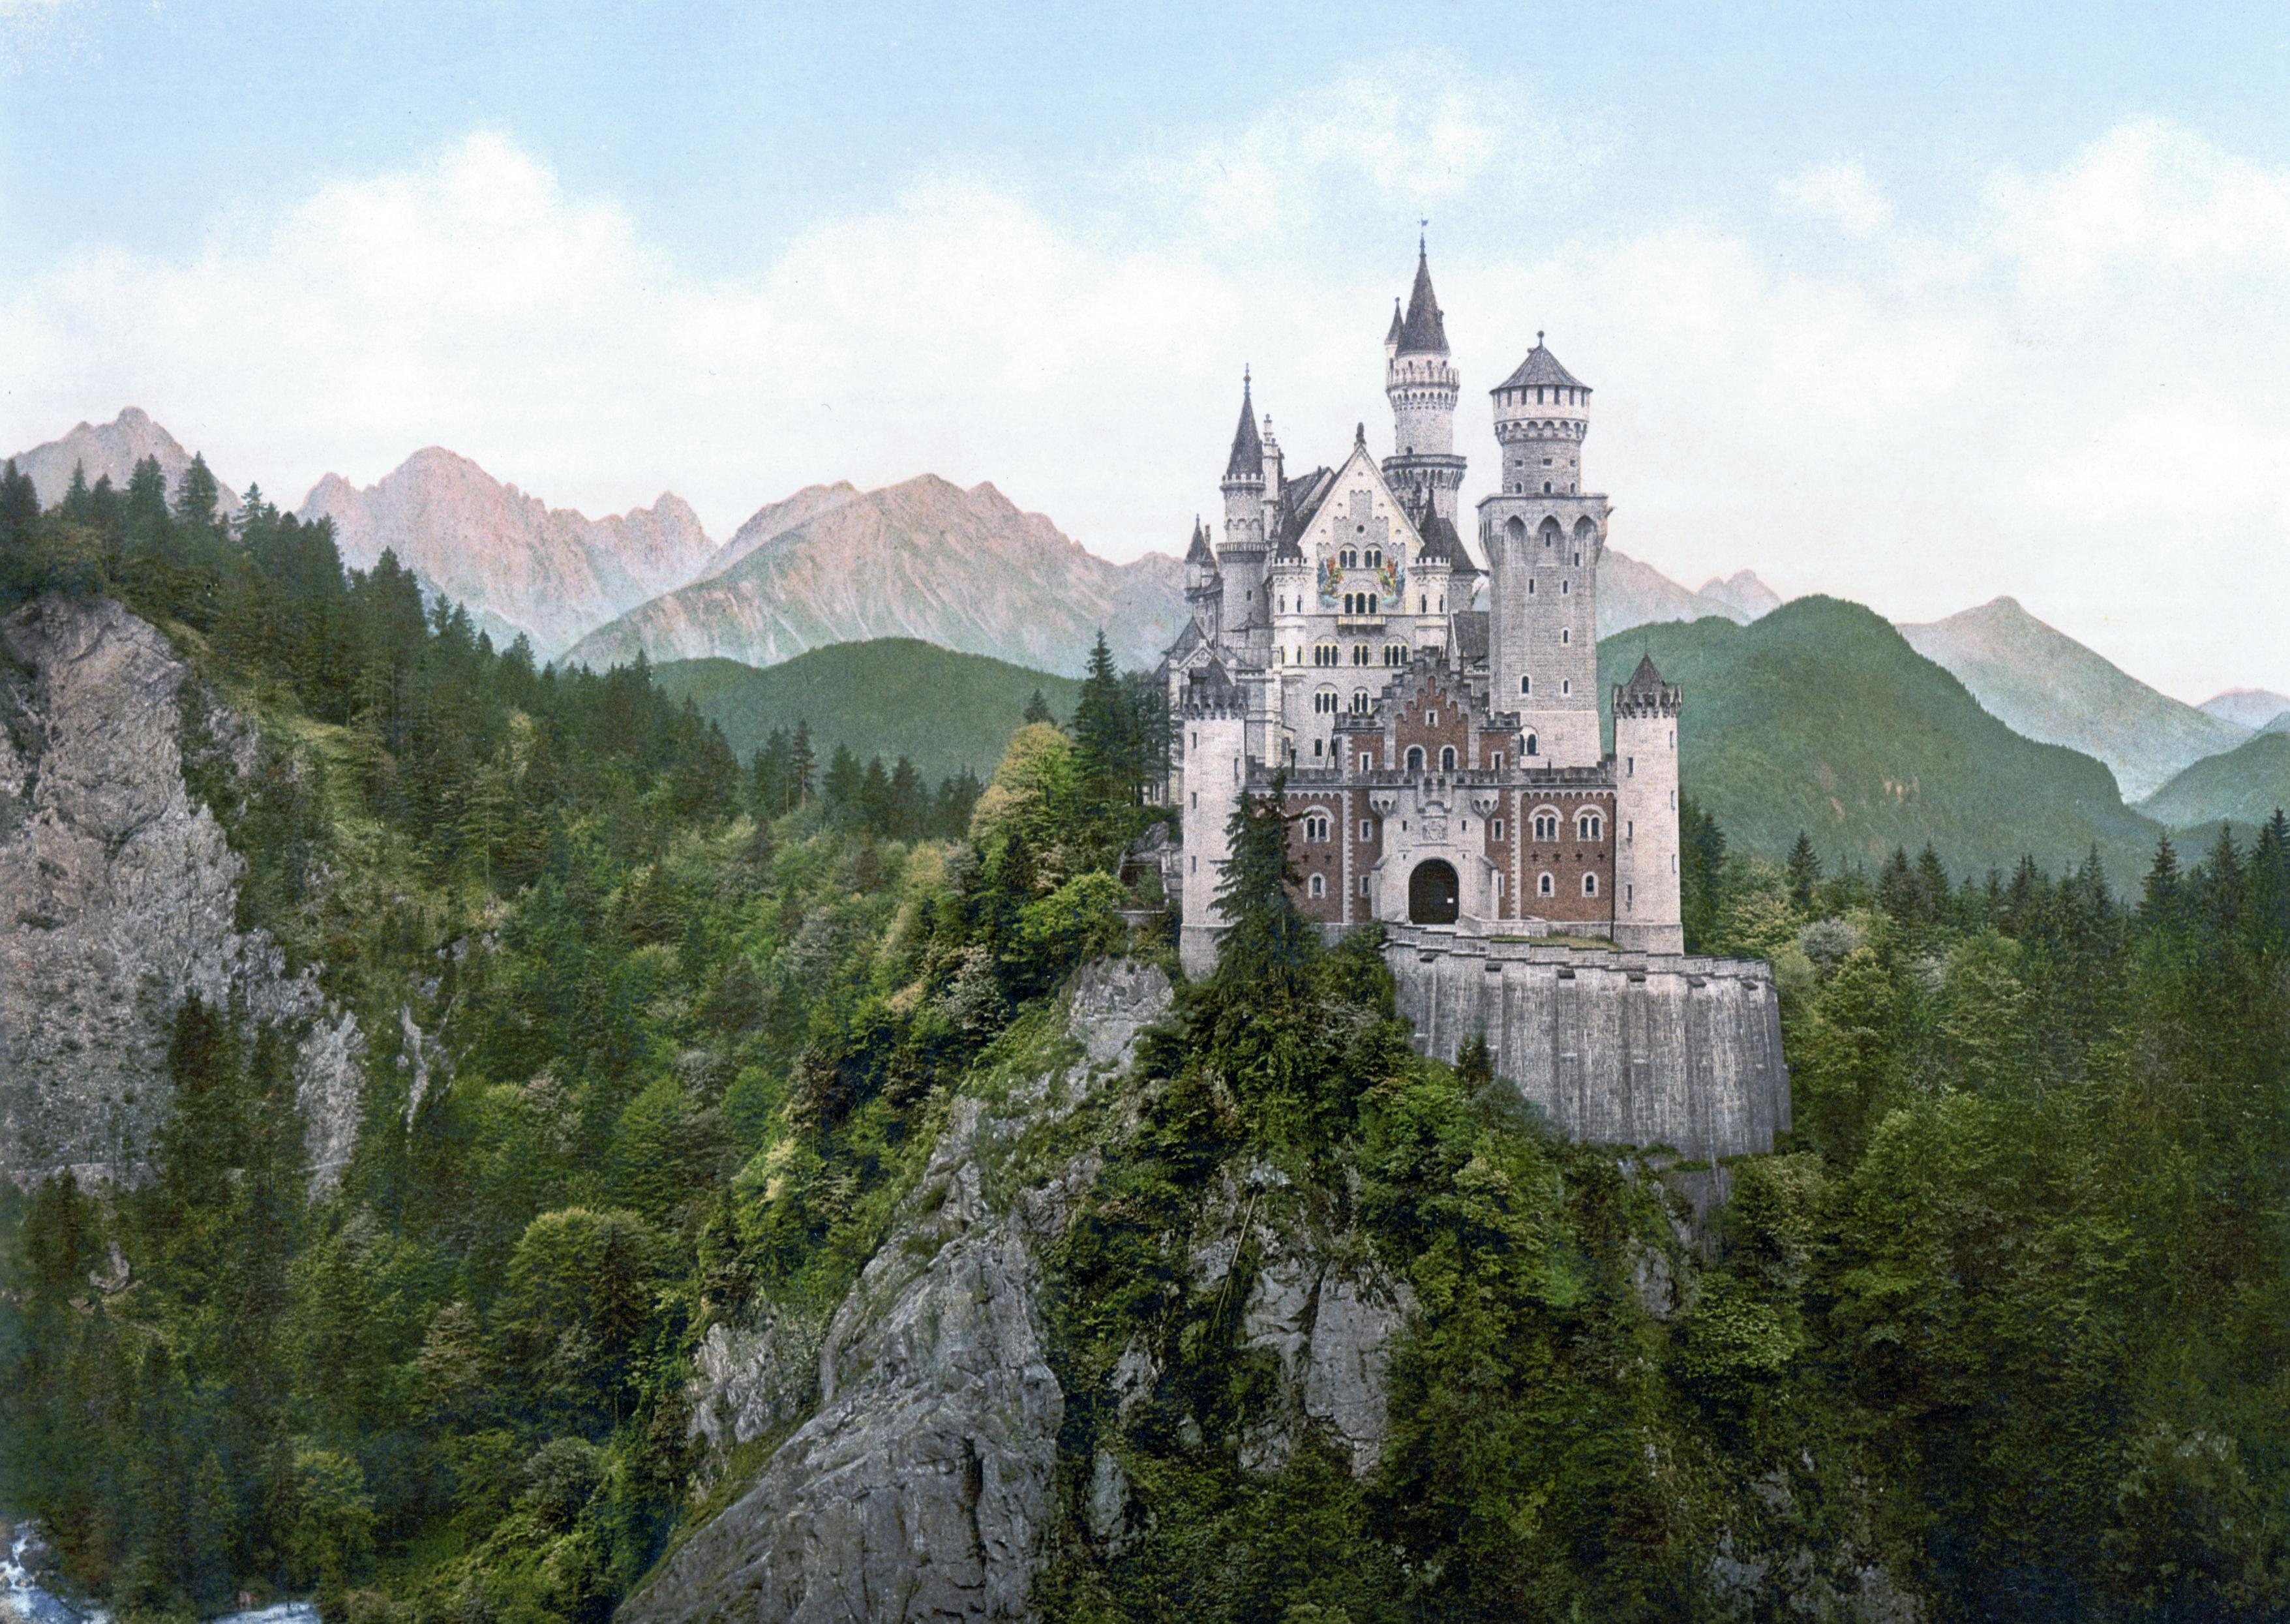 FileNeuschwanstein Castle LOC printjpg   Wikipedia the 3511x2490